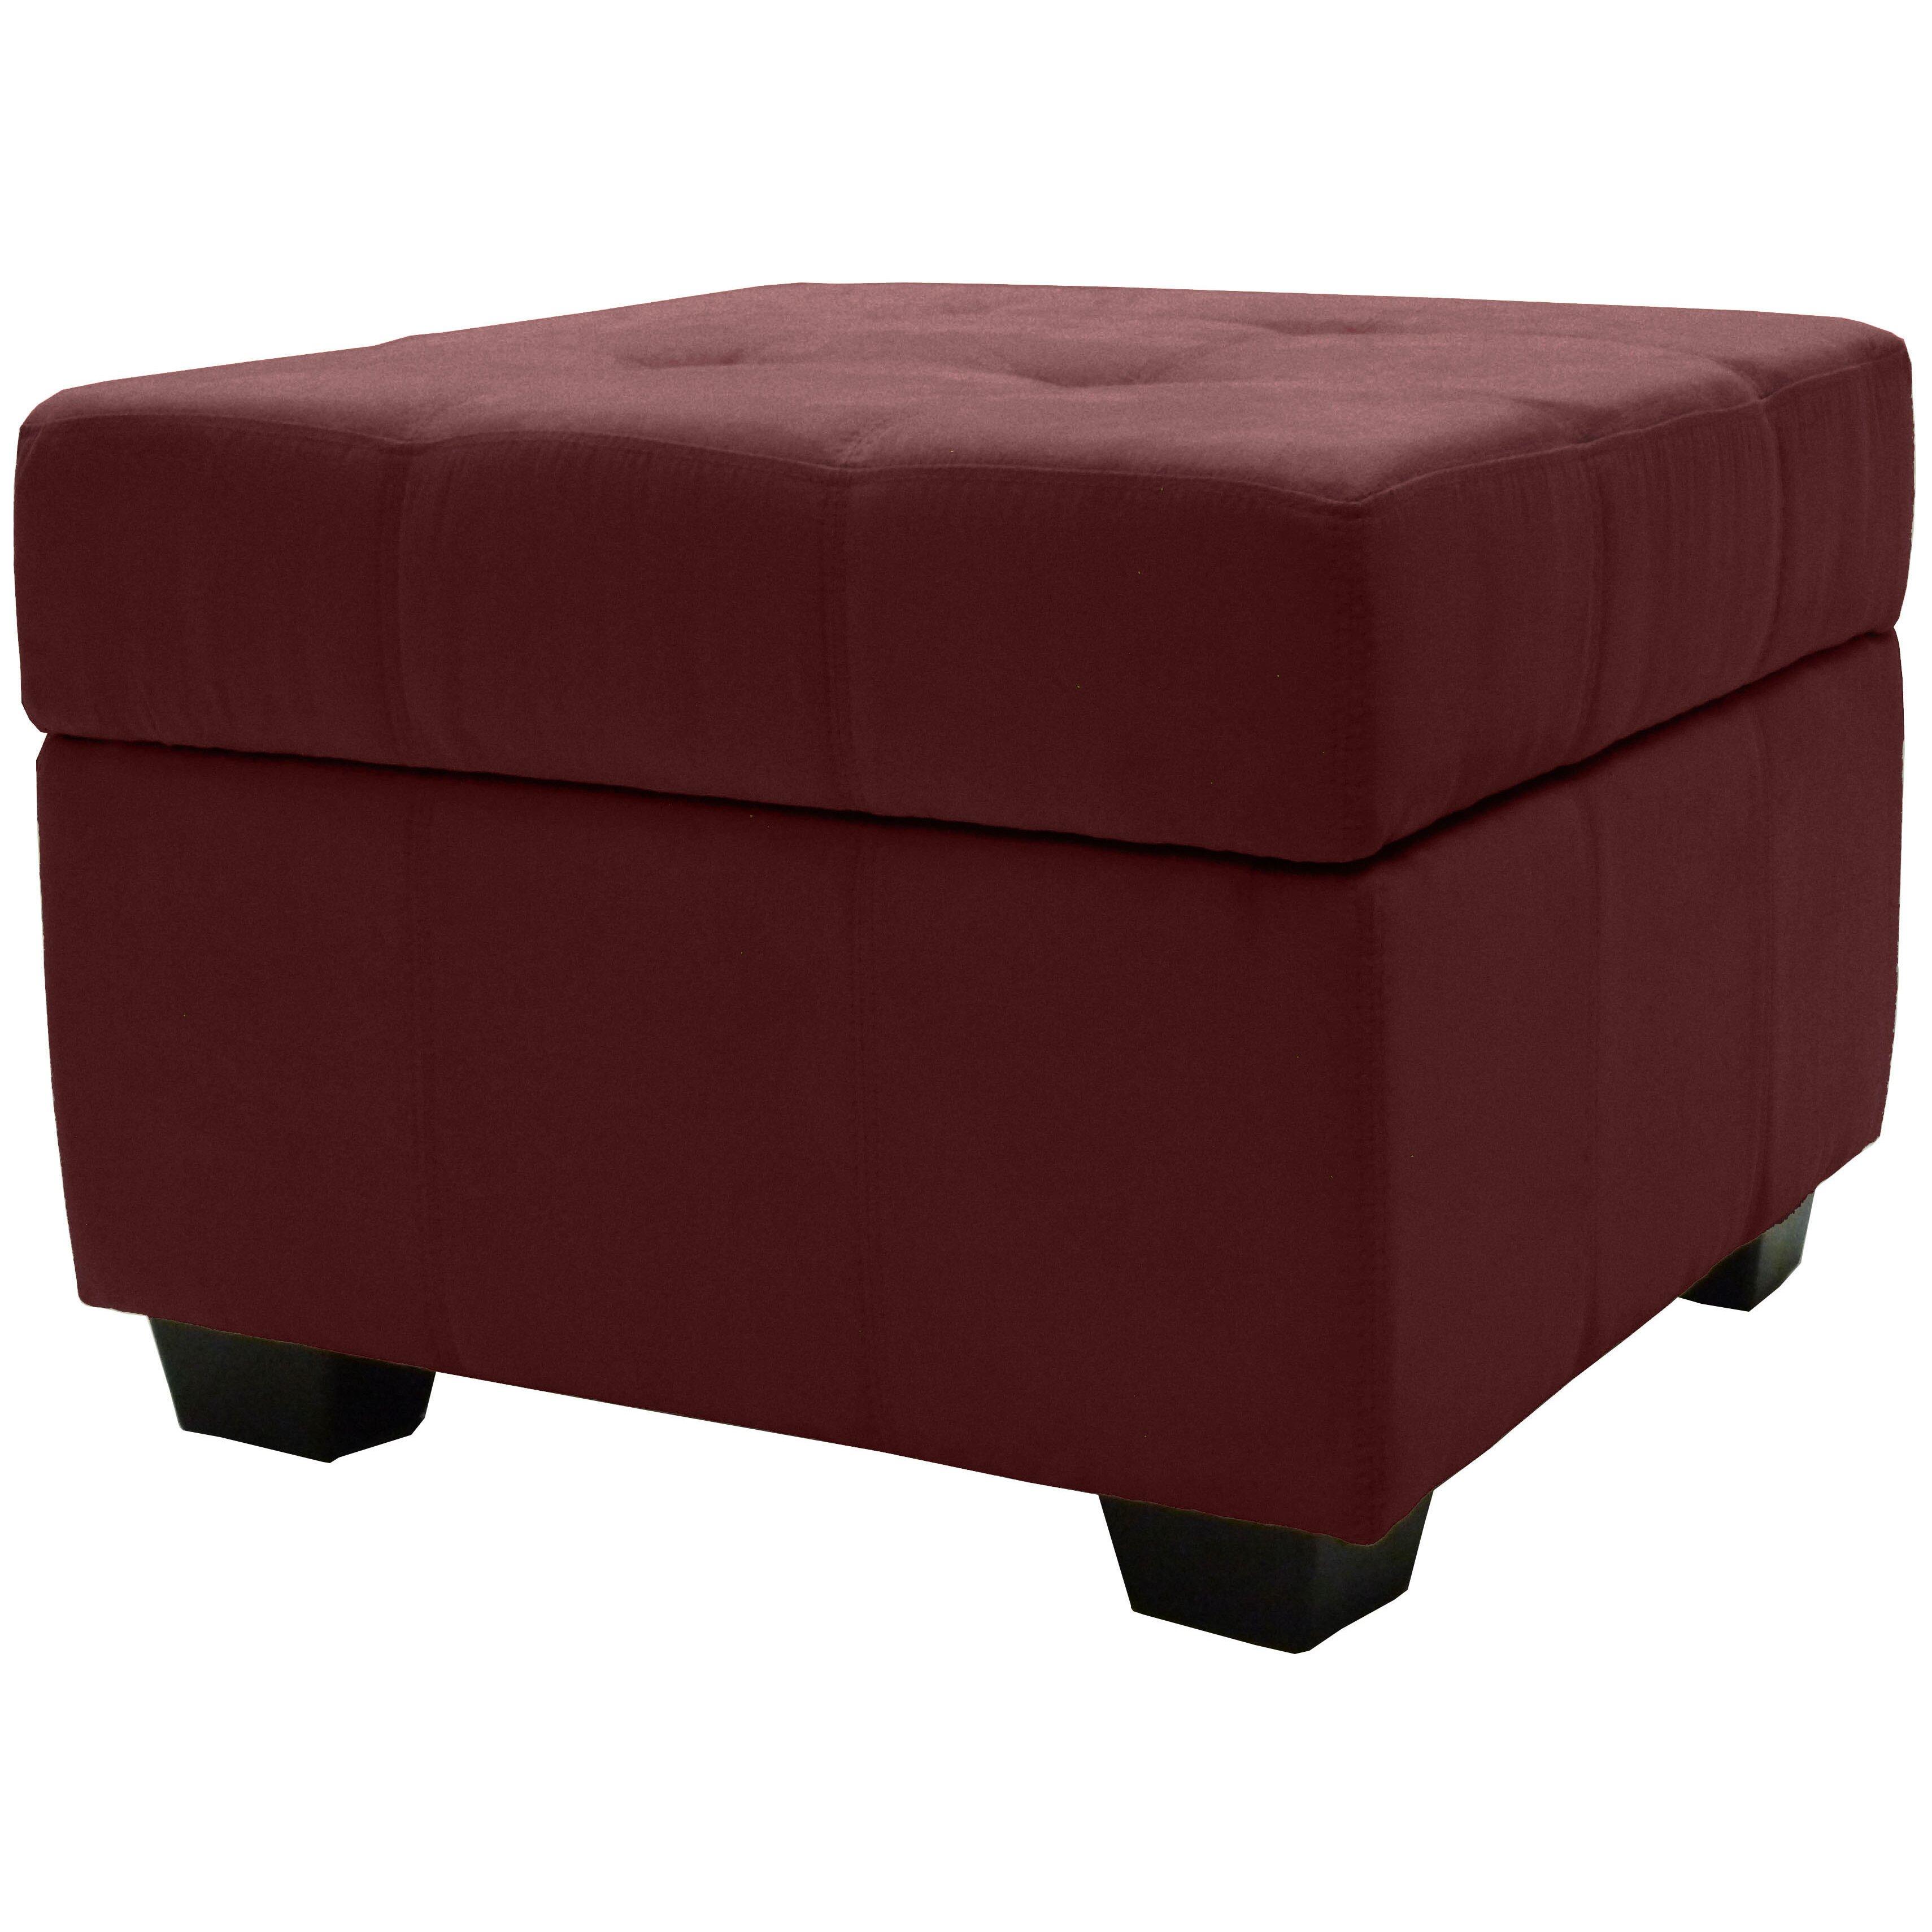 epic furnishings llc biltmore tufted padded hinged storage. Black Bedroom Furniture Sets. Home Design Ideas